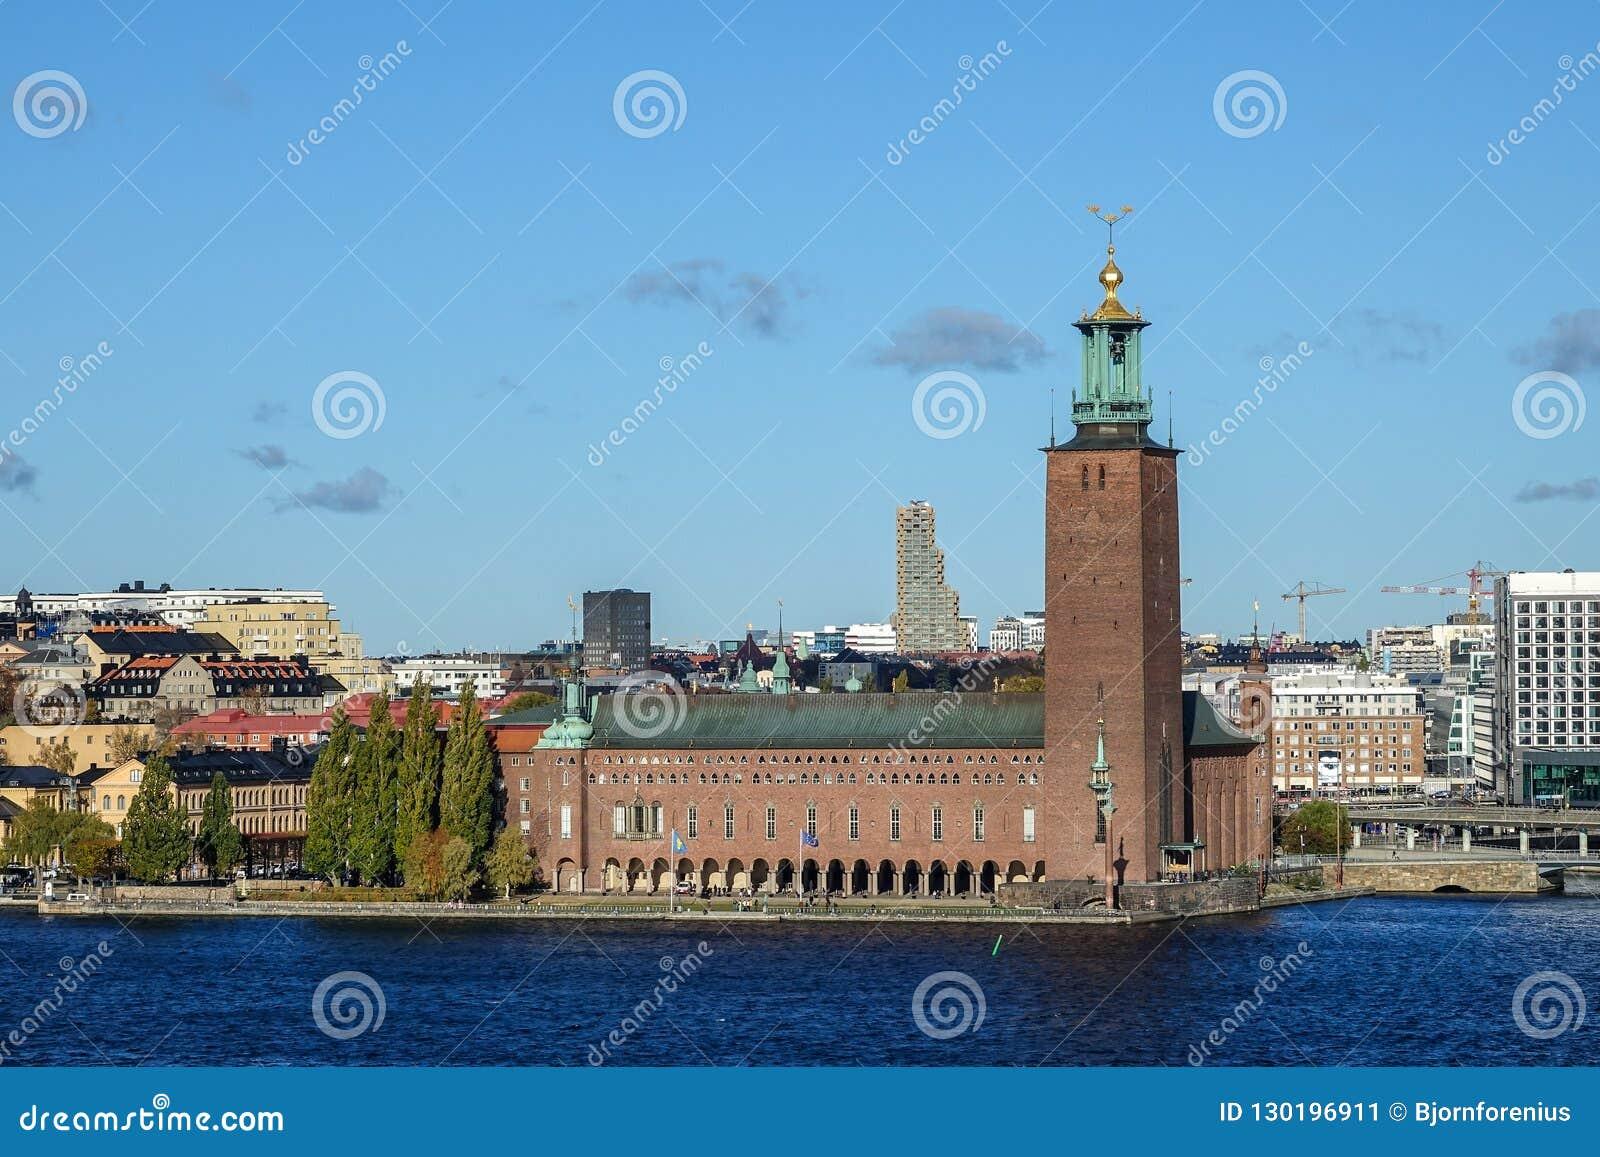 78208cb5e371 Stockholm, Sweden - October 22, 2018: The Stockholm City Hall in Swedish: Stockholms  stadshus or Stadshuset locally